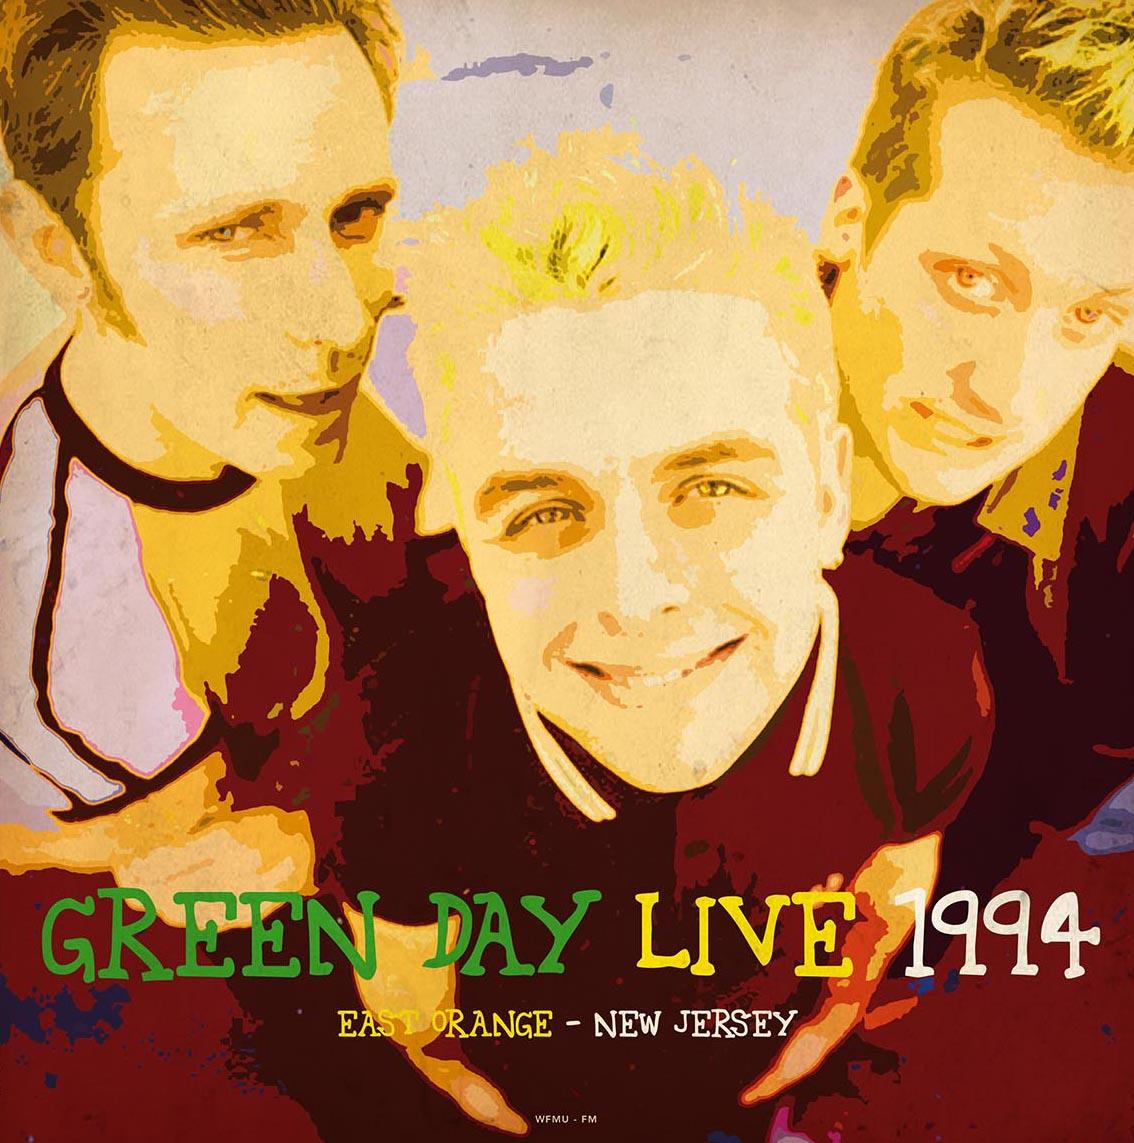 Green Day/LIVE 1994 WFMU-FM (180g) LP